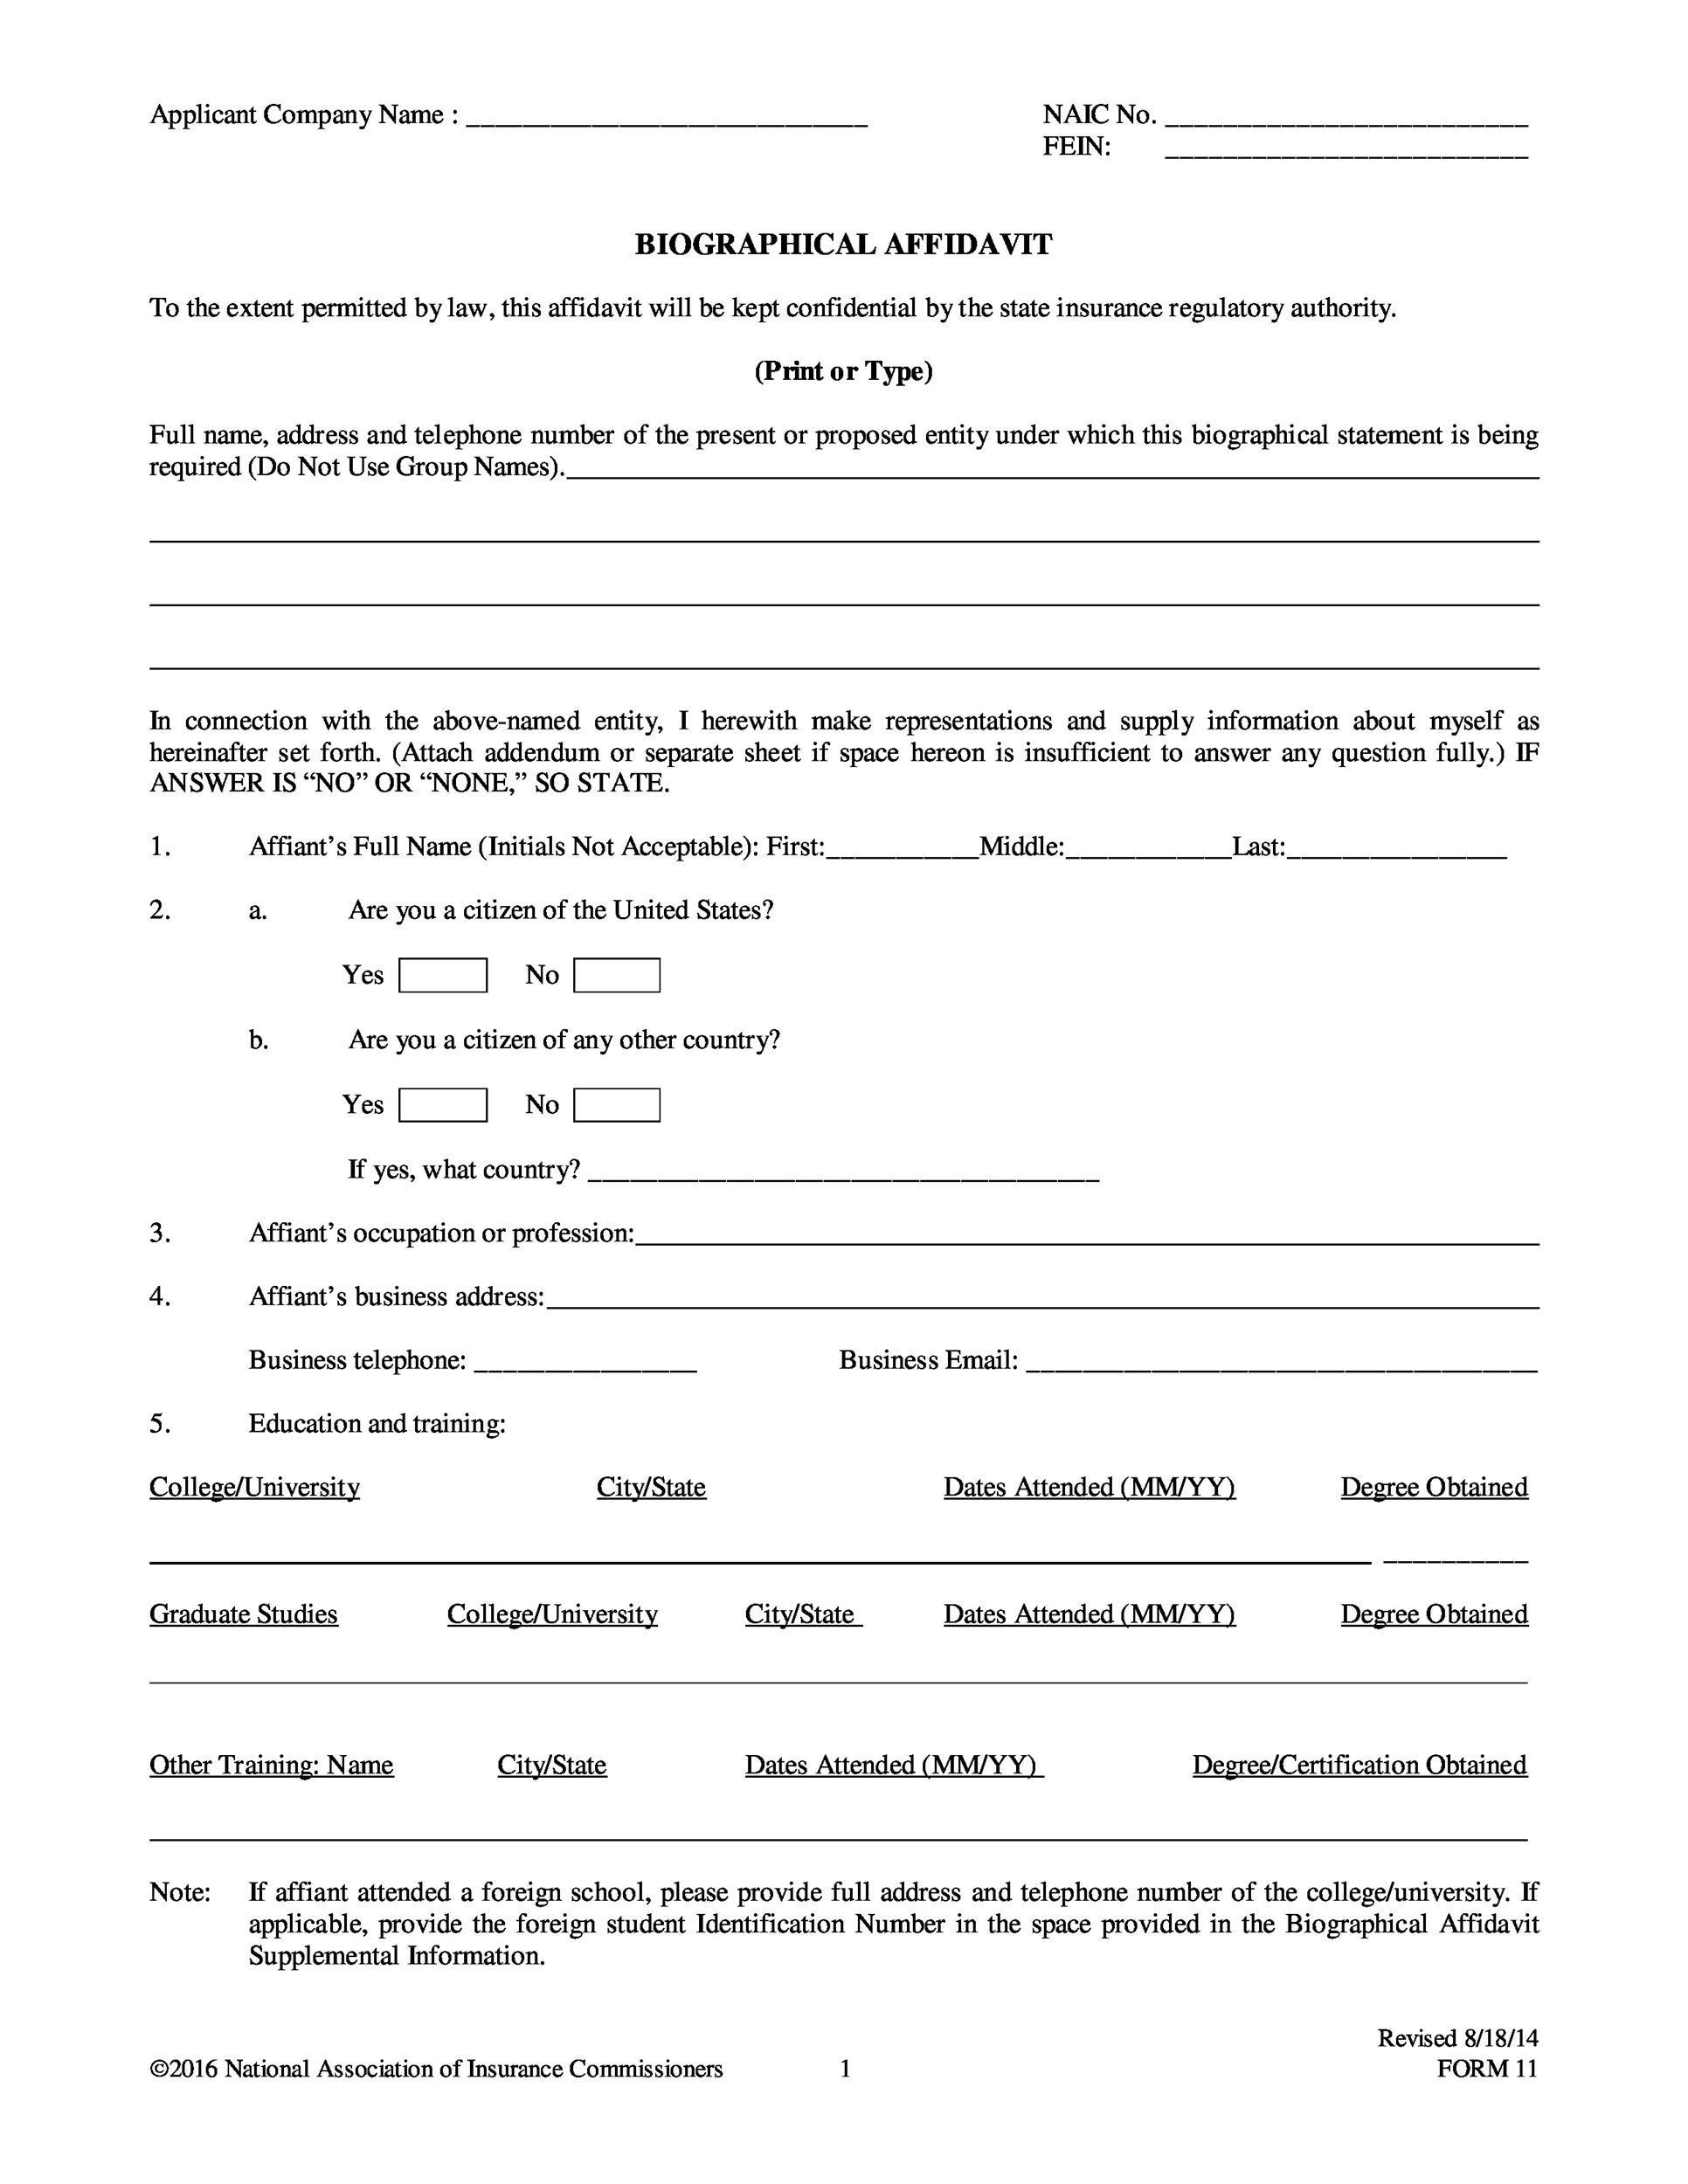 Free affidavit form 32